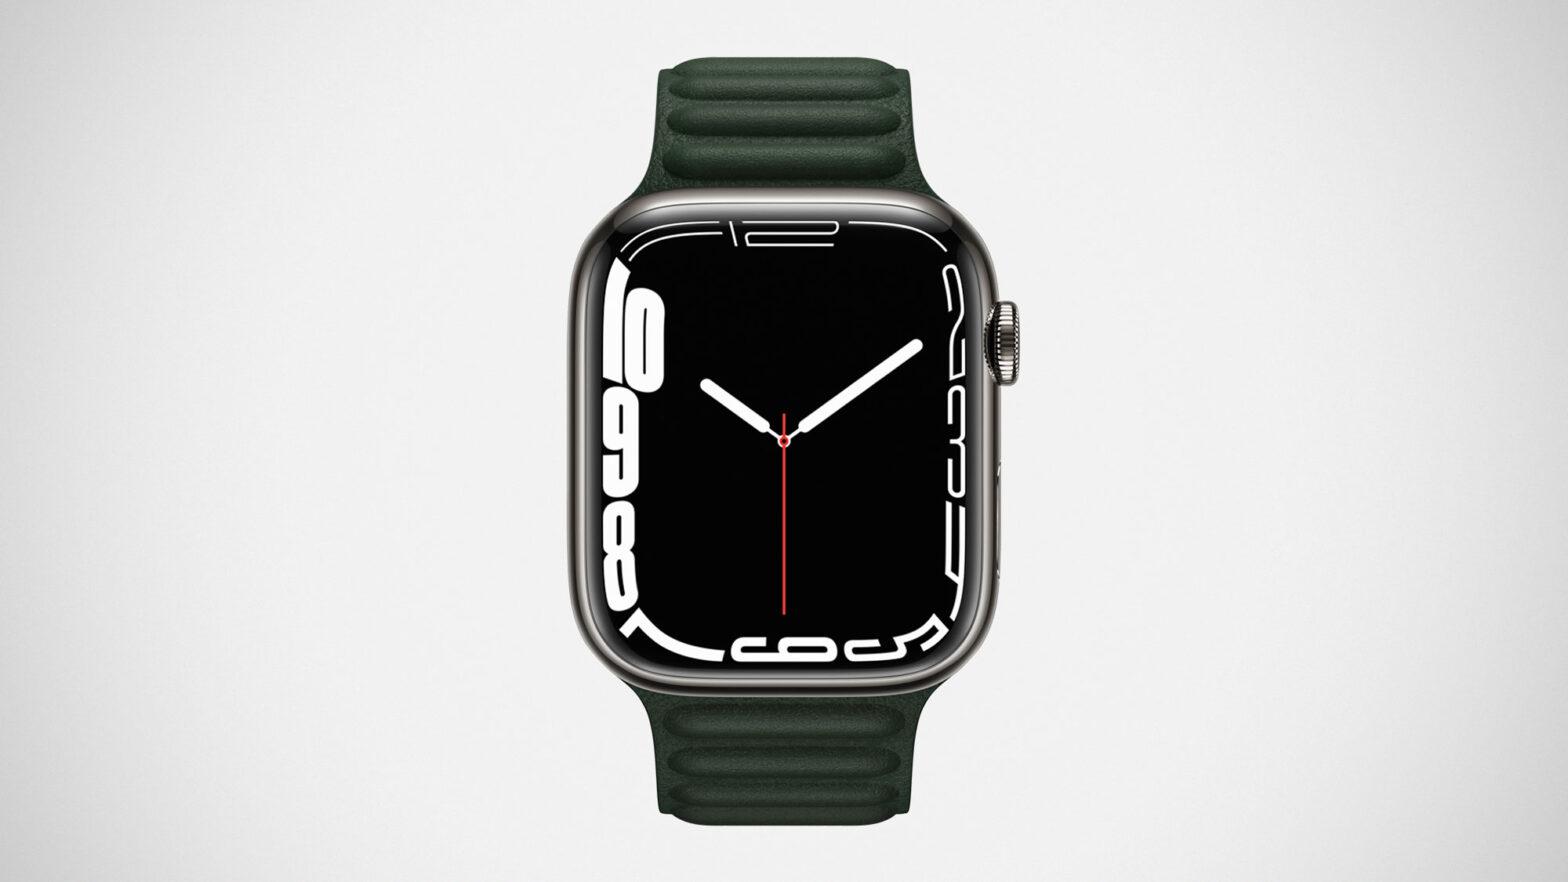 2021 Apple Watch Series 7 Smartwatch